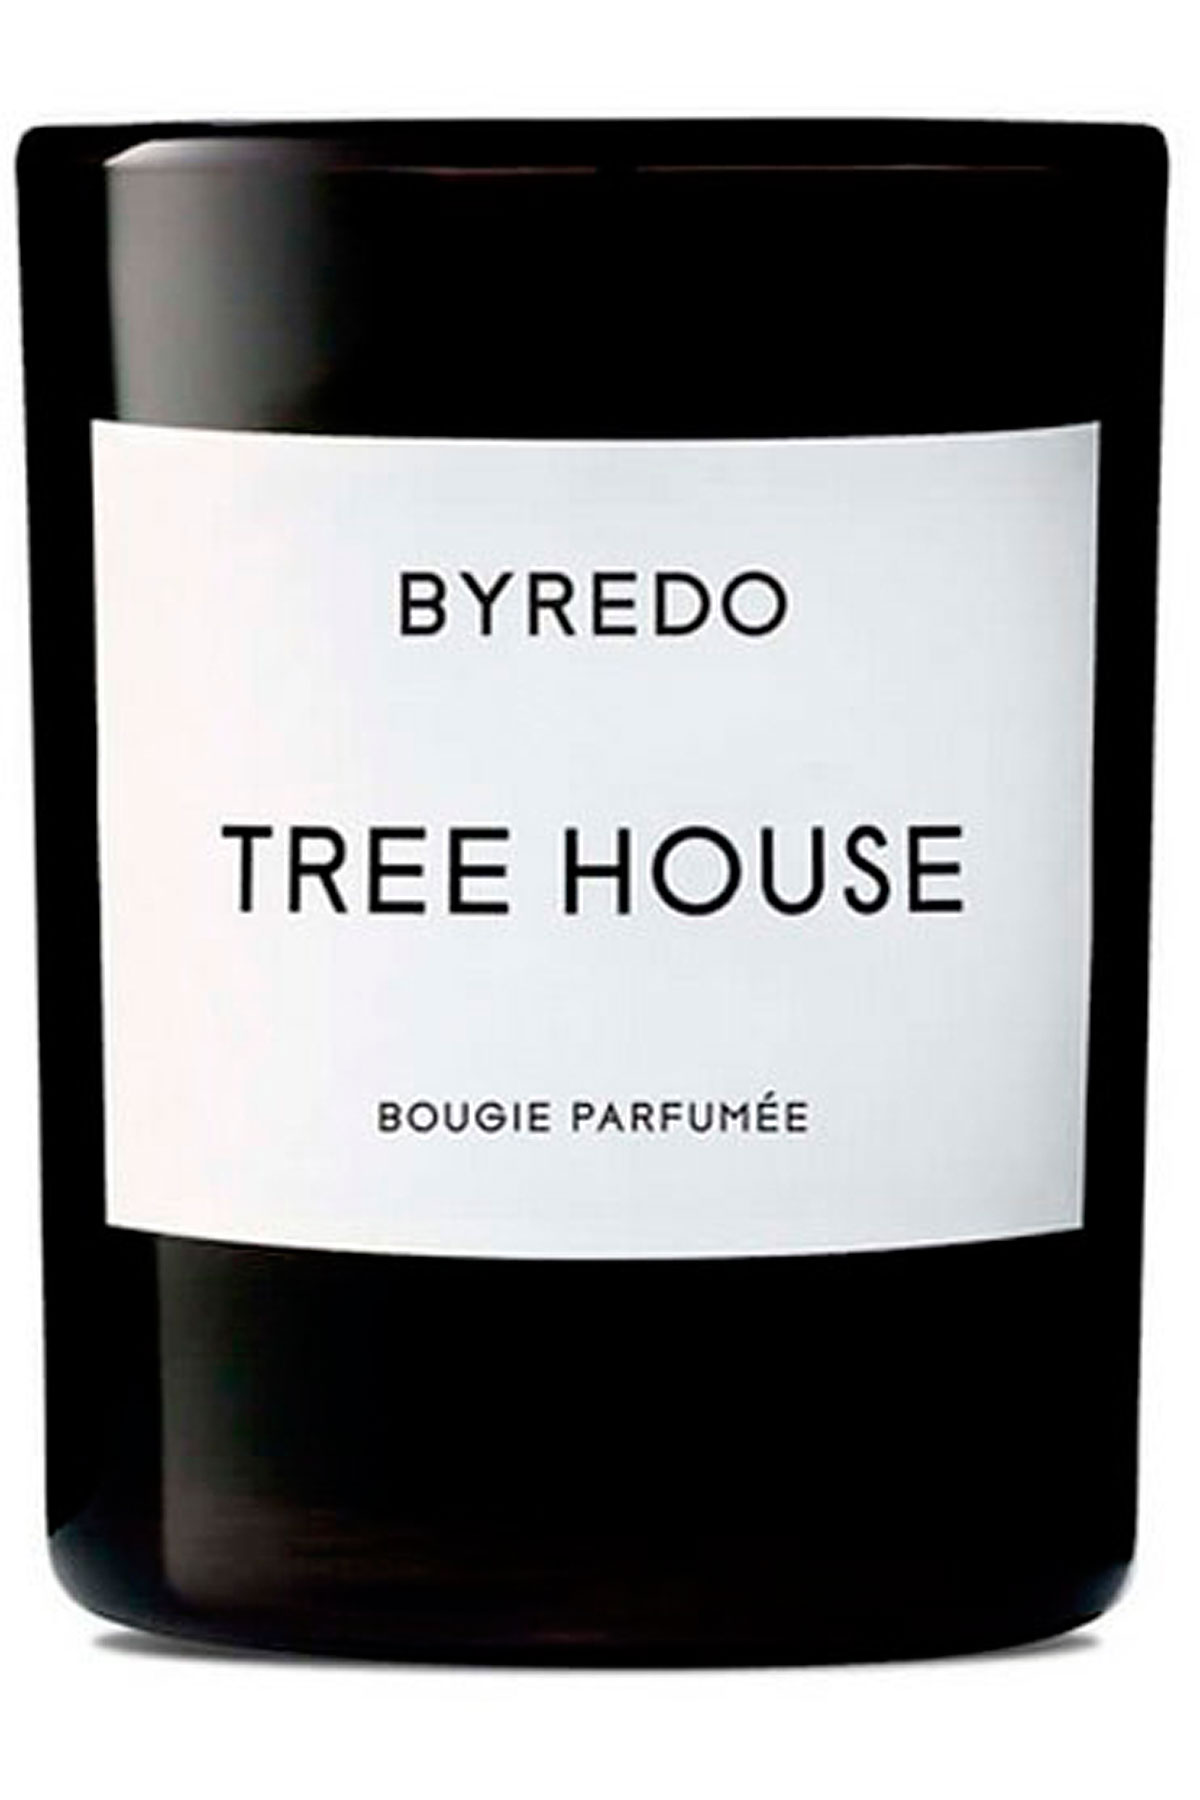 Byredo Home Scents for Women On Sale, Tree House - 240 Gr, 2019, 240 gr